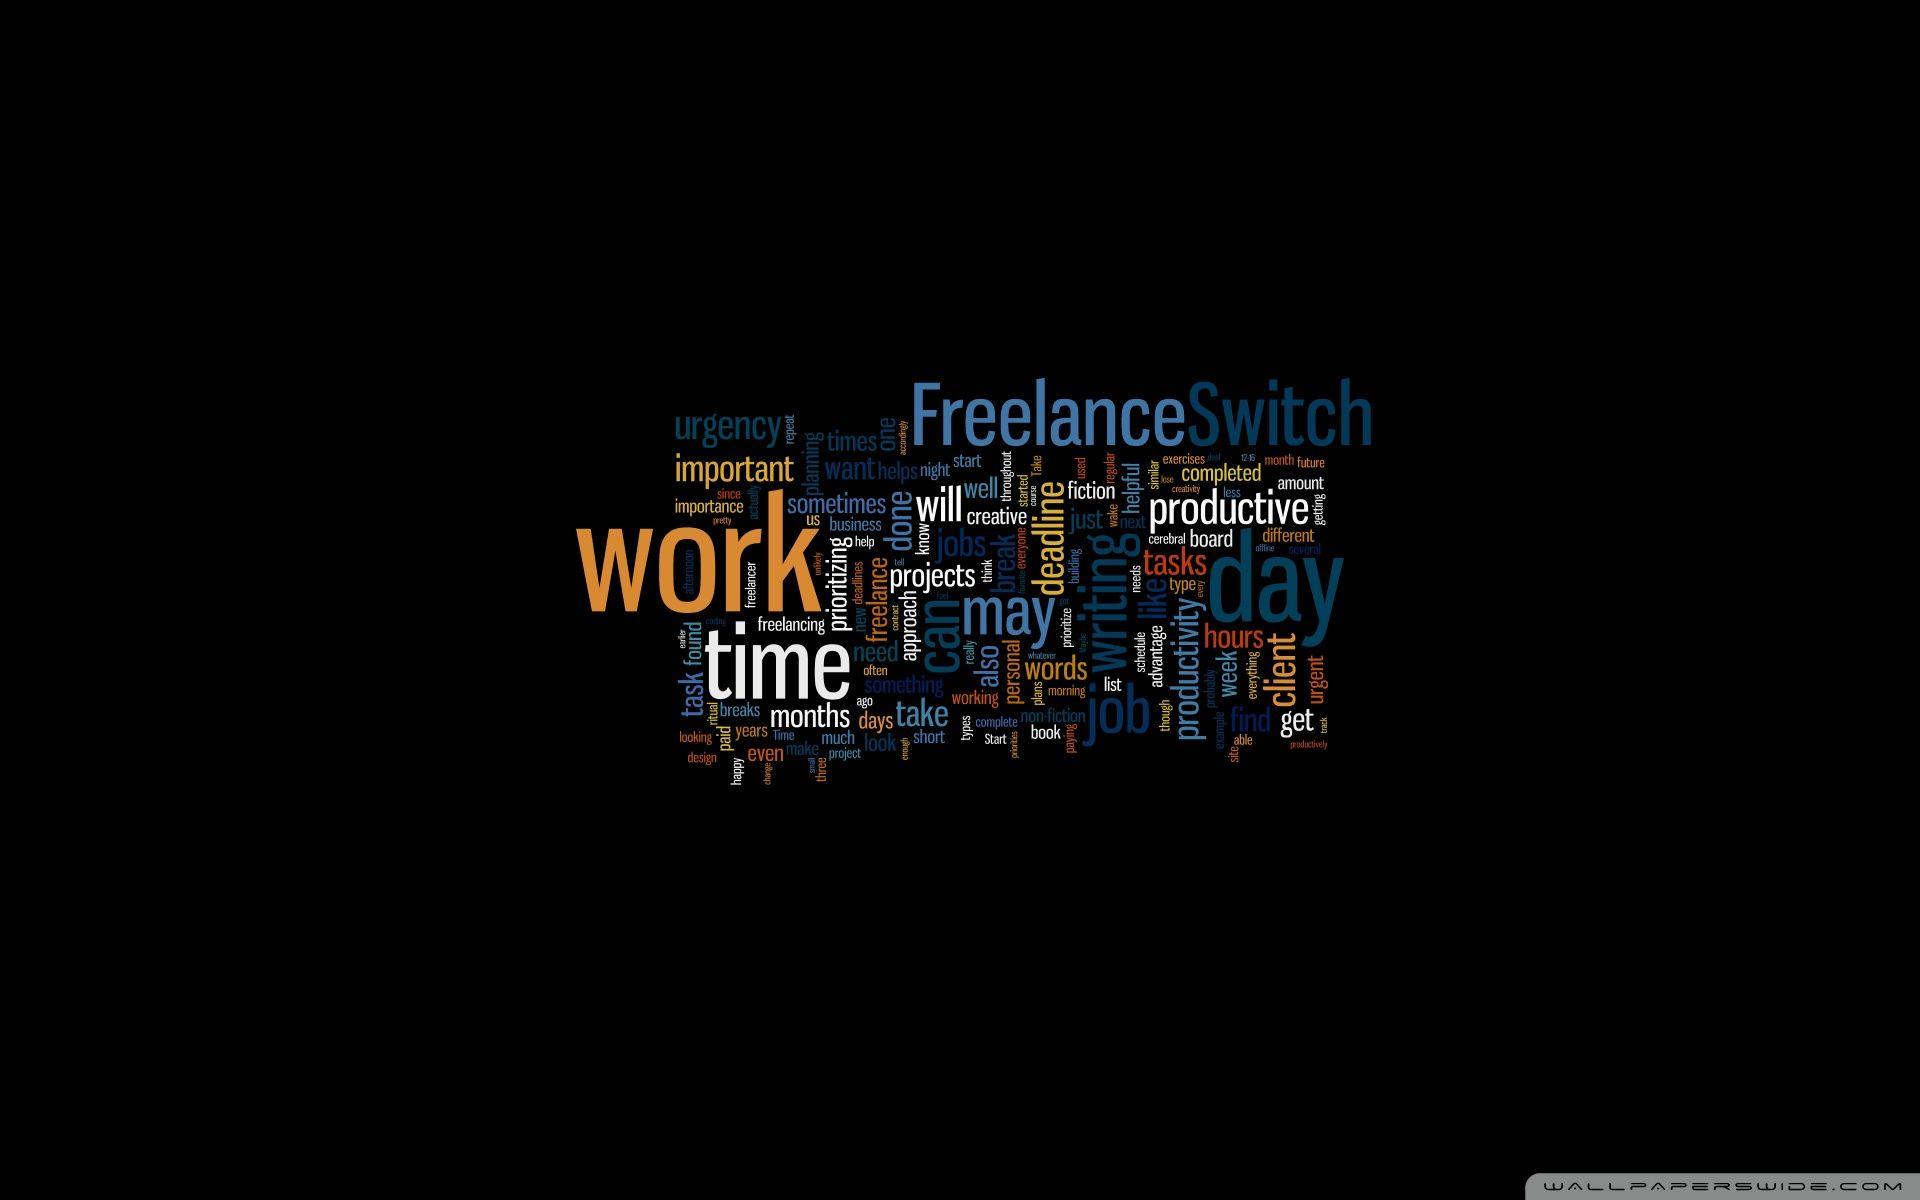 Work Image Laptop Wallpaper Ipad Wallpaper Ipad Air Wallpaper